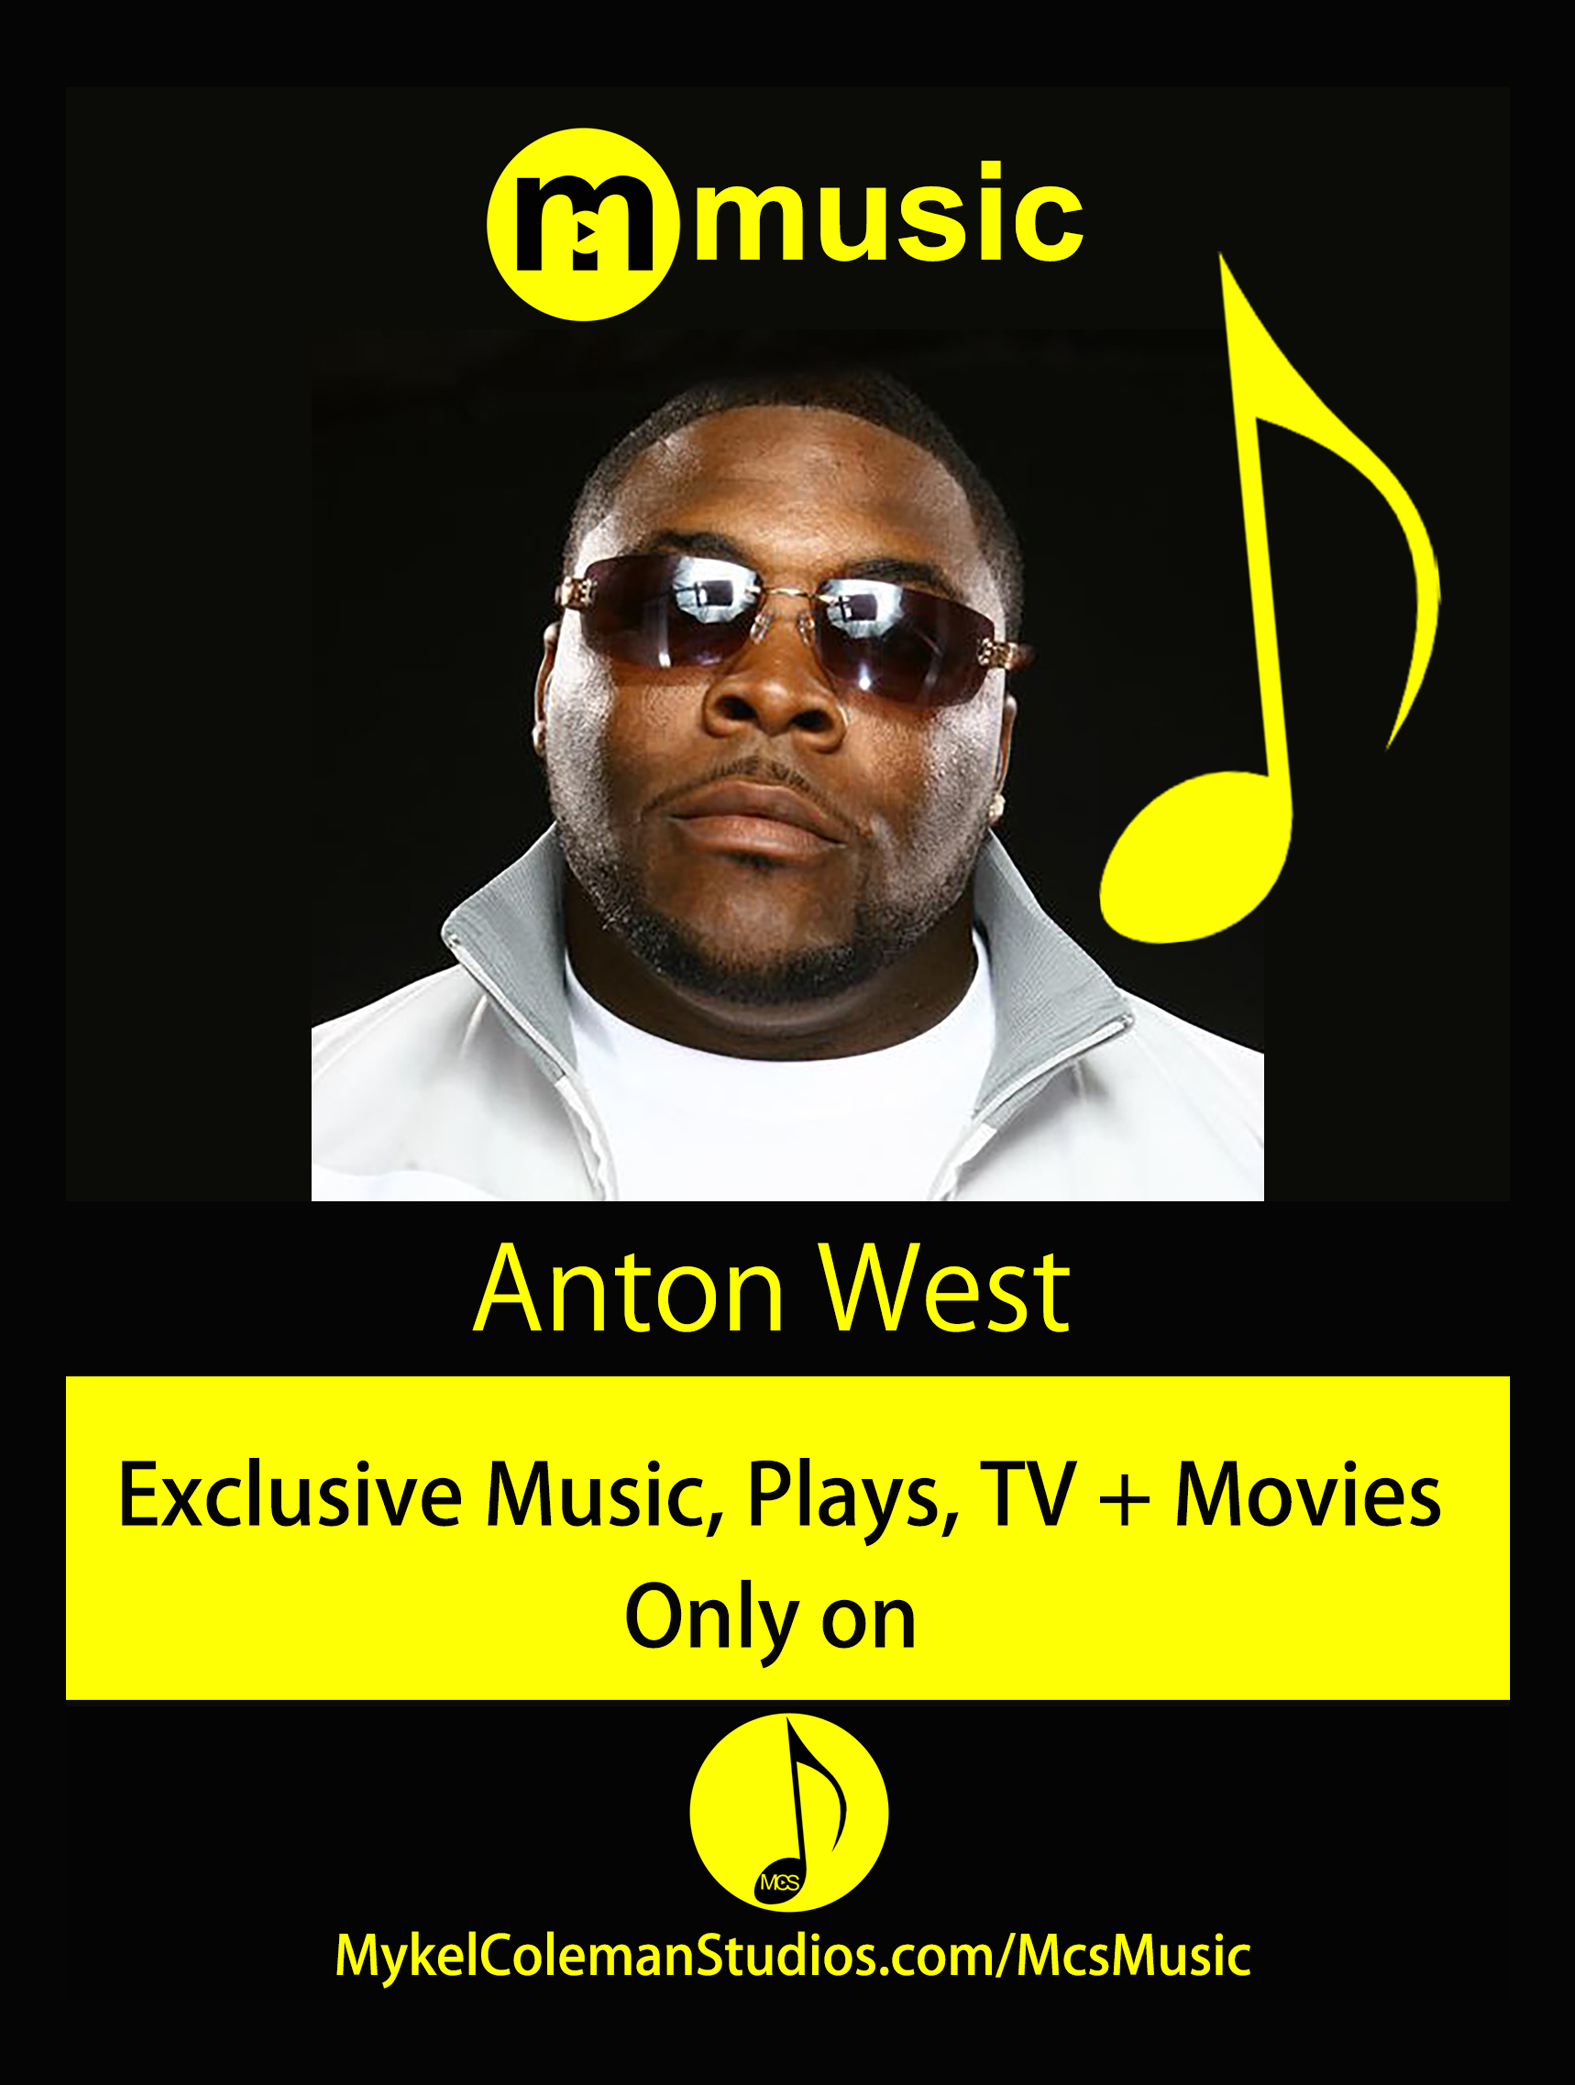 AWest MCS Music Billboard